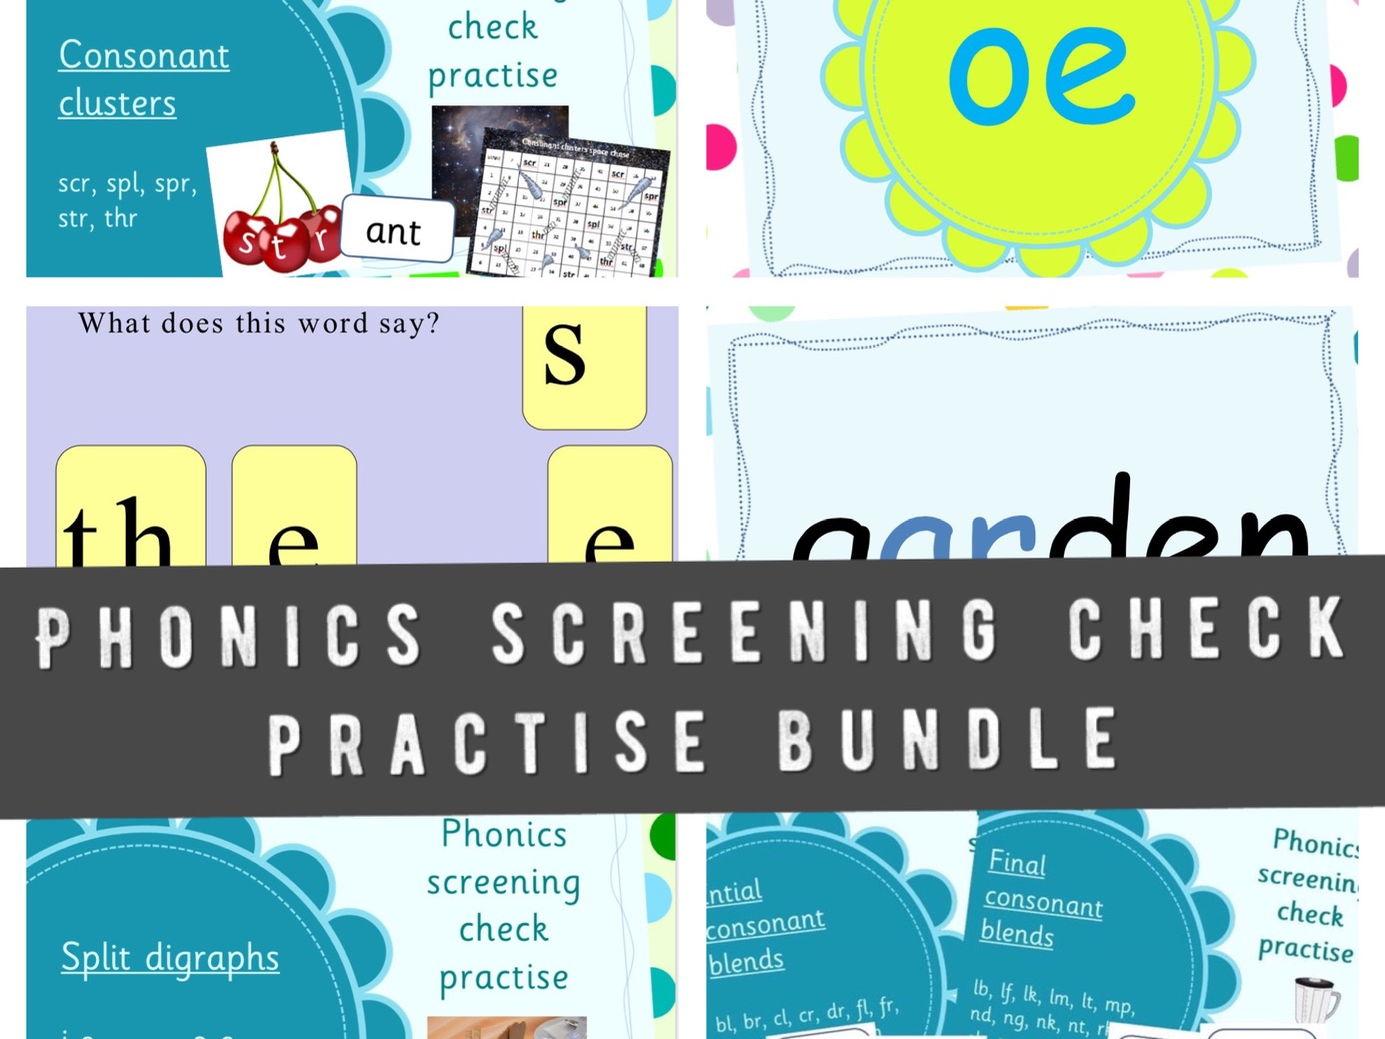 Phonics screening check practise bundle